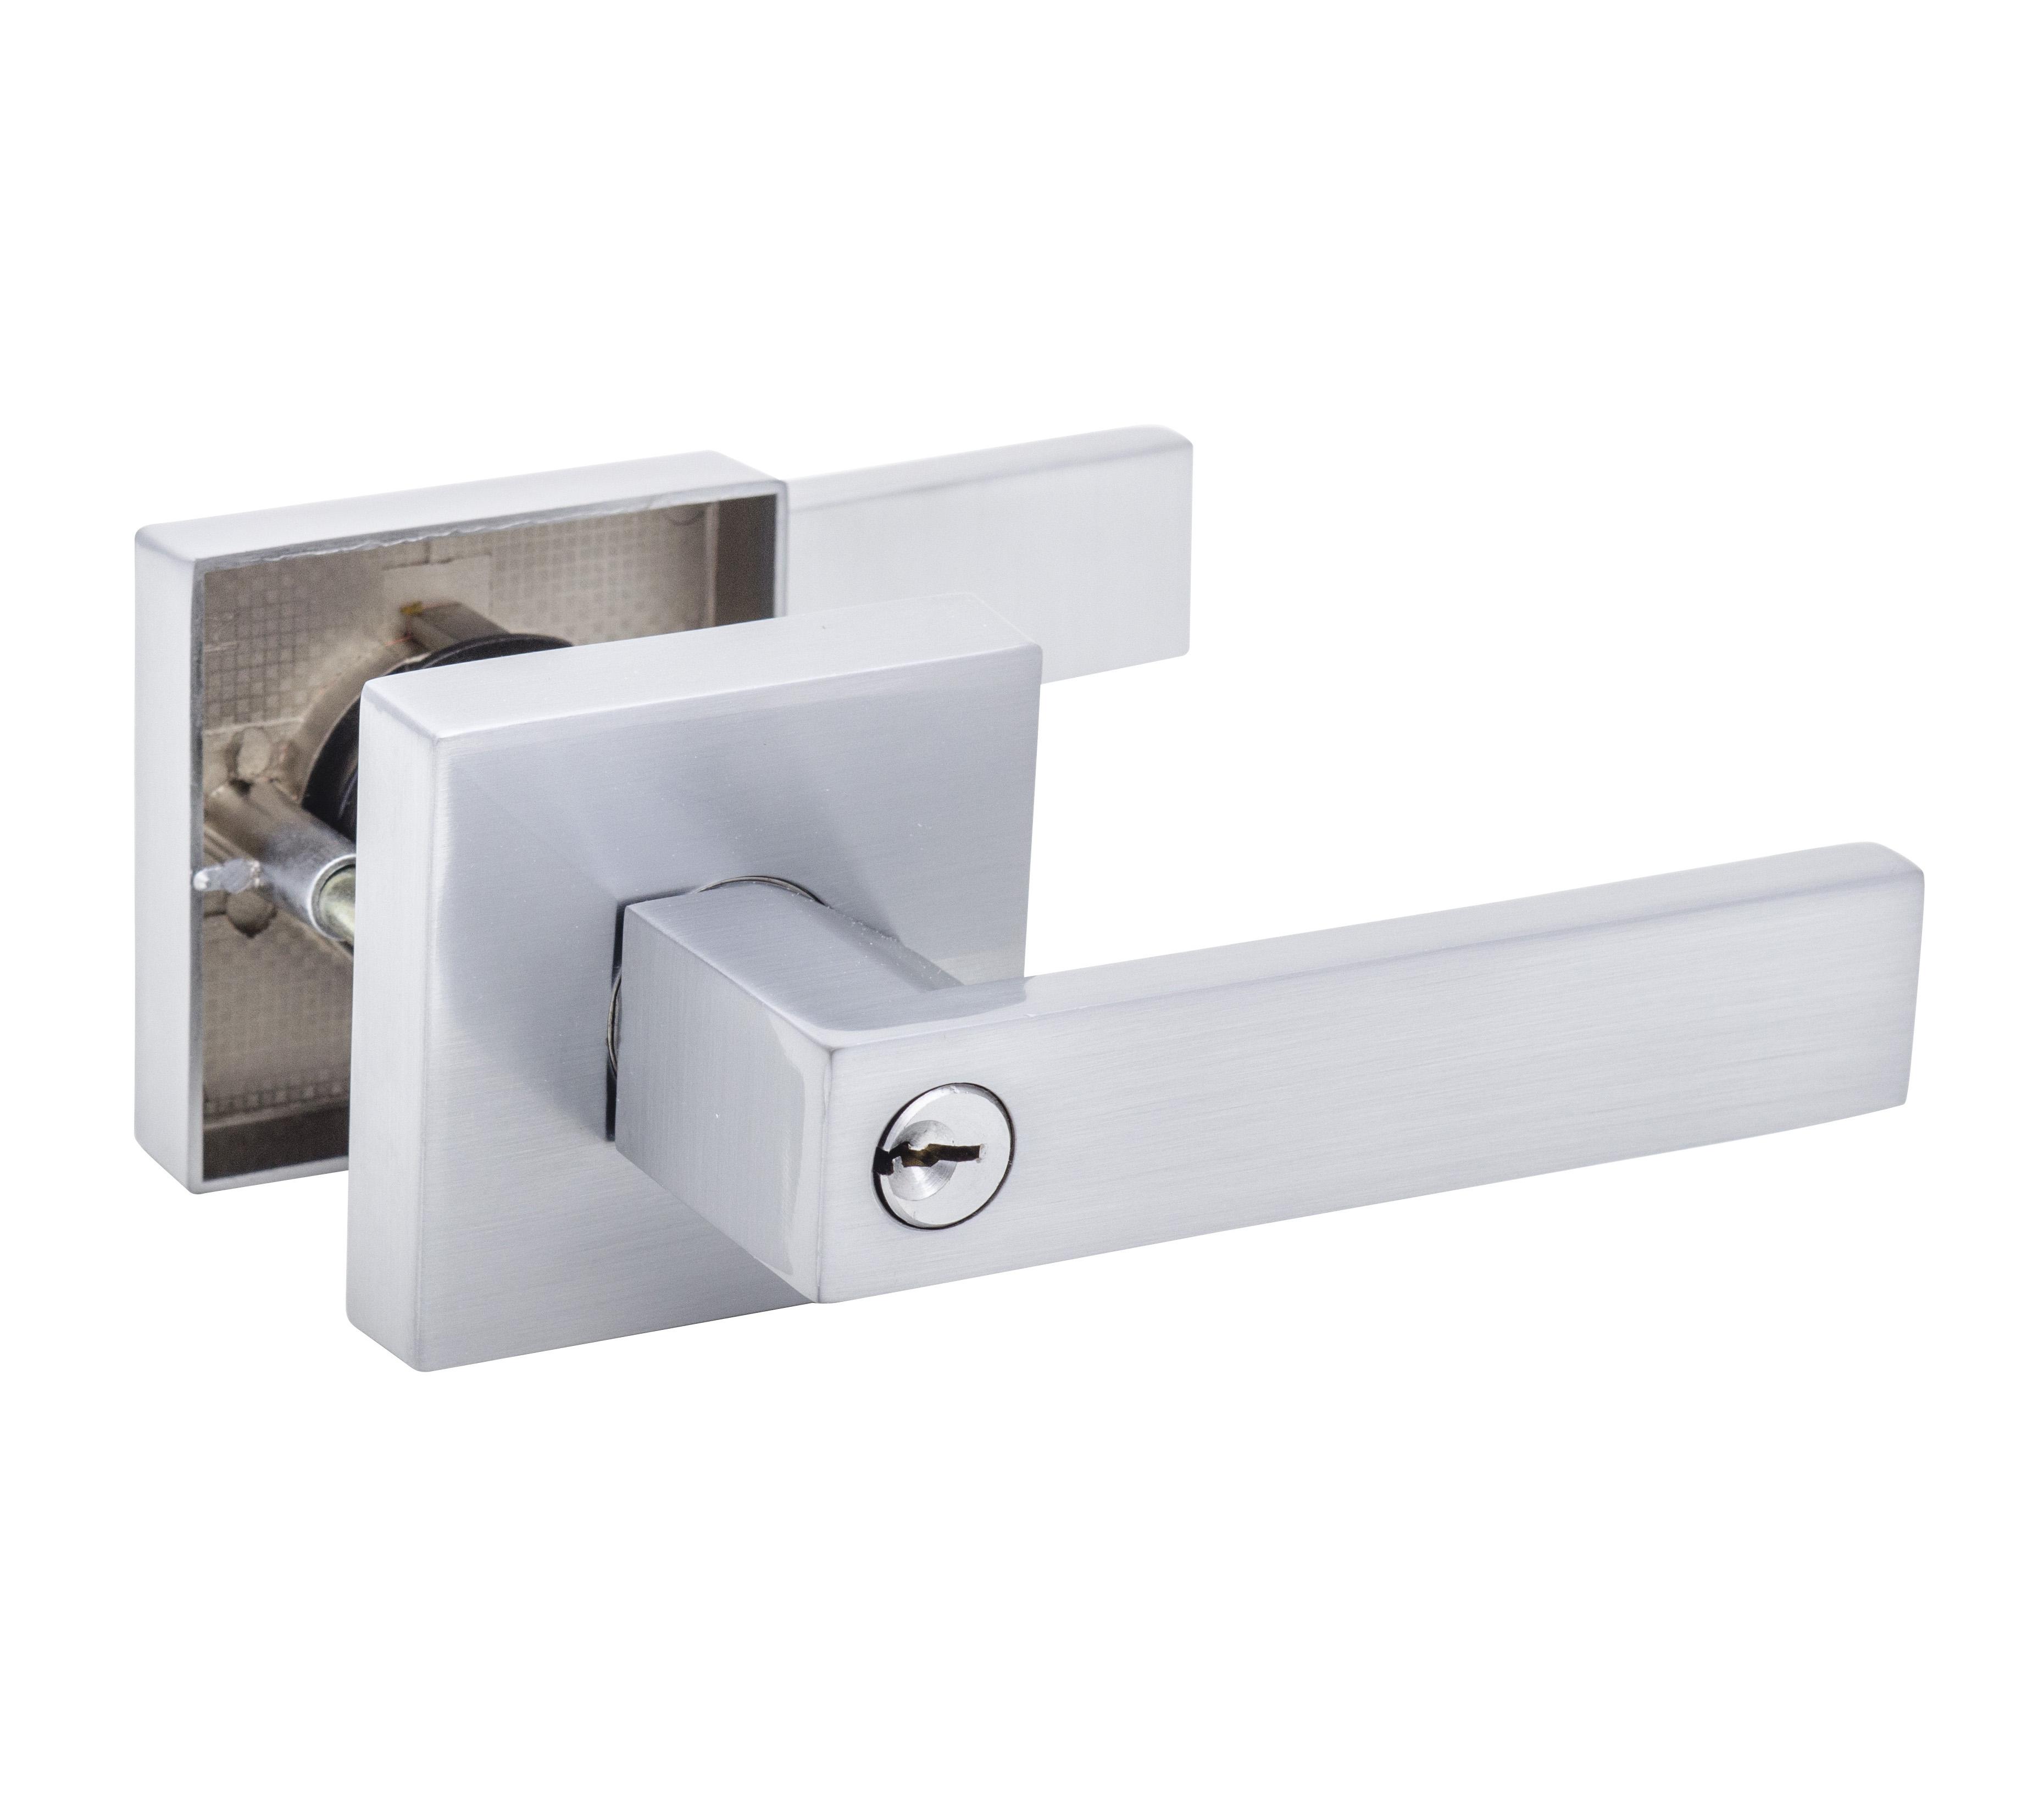 bathroom door knob with lock photo - 12